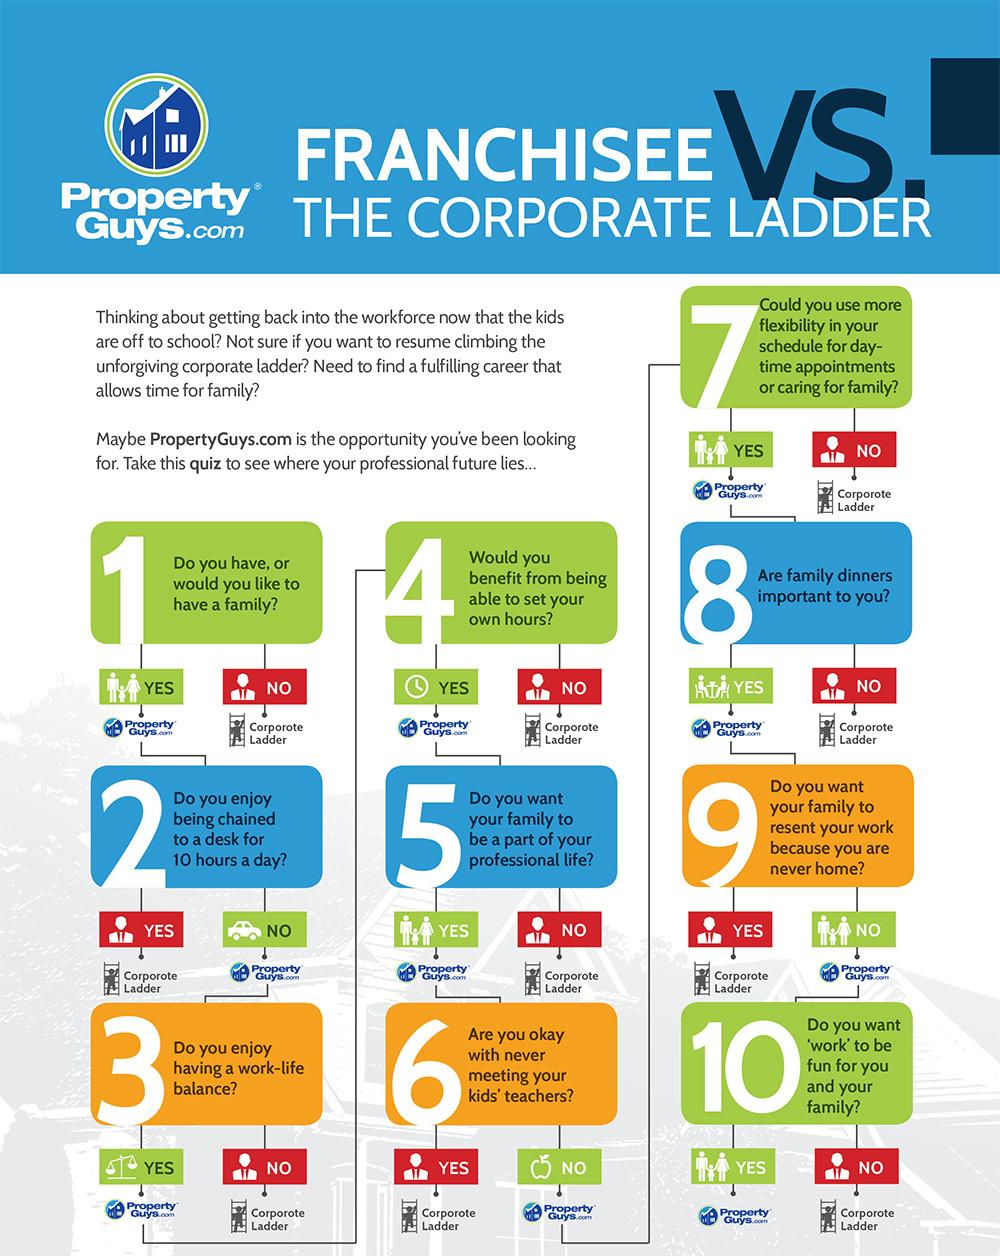 property guys franchisee vs ladder